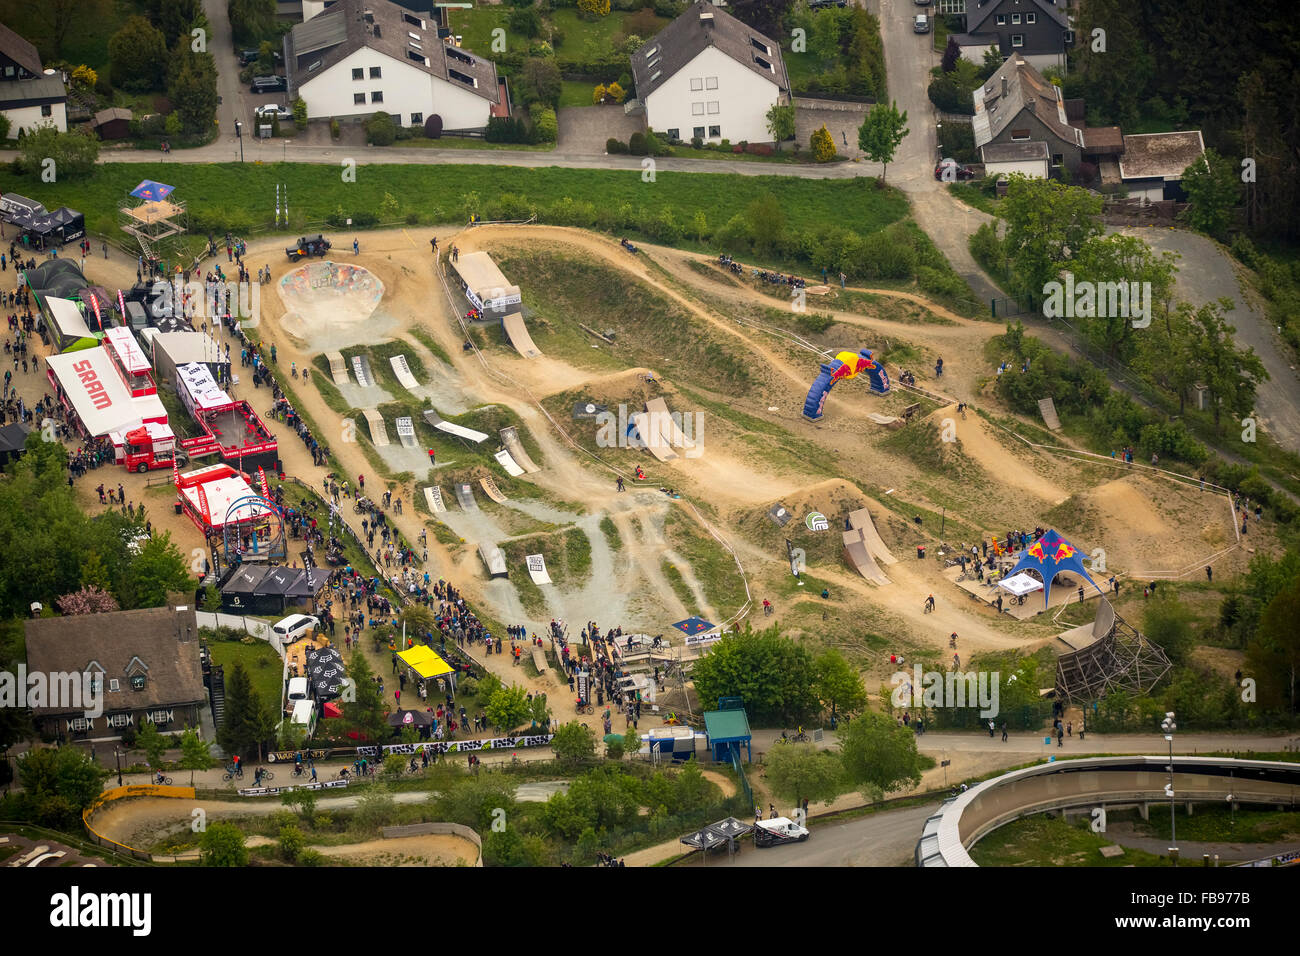 Aerial view, iXS Dirt Masters Mountainbike Freeride Festival at the Bike Park Winterberg, Winterberg, Sauerland - Stock Image